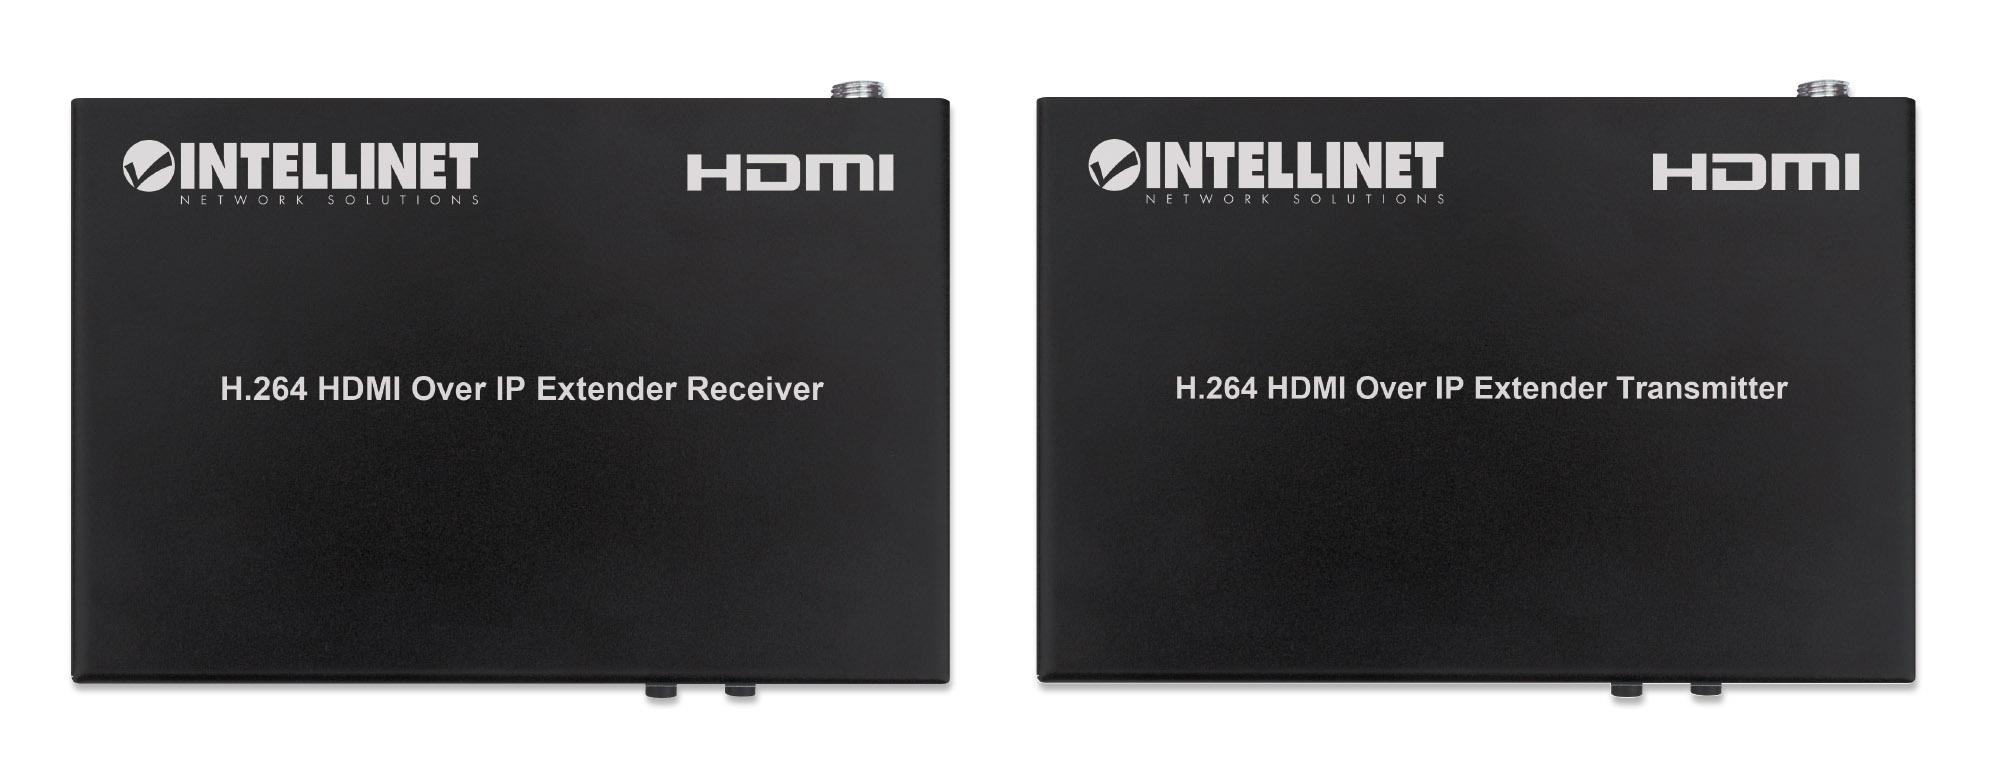 H.264 HDMI Over IP Extender Kit